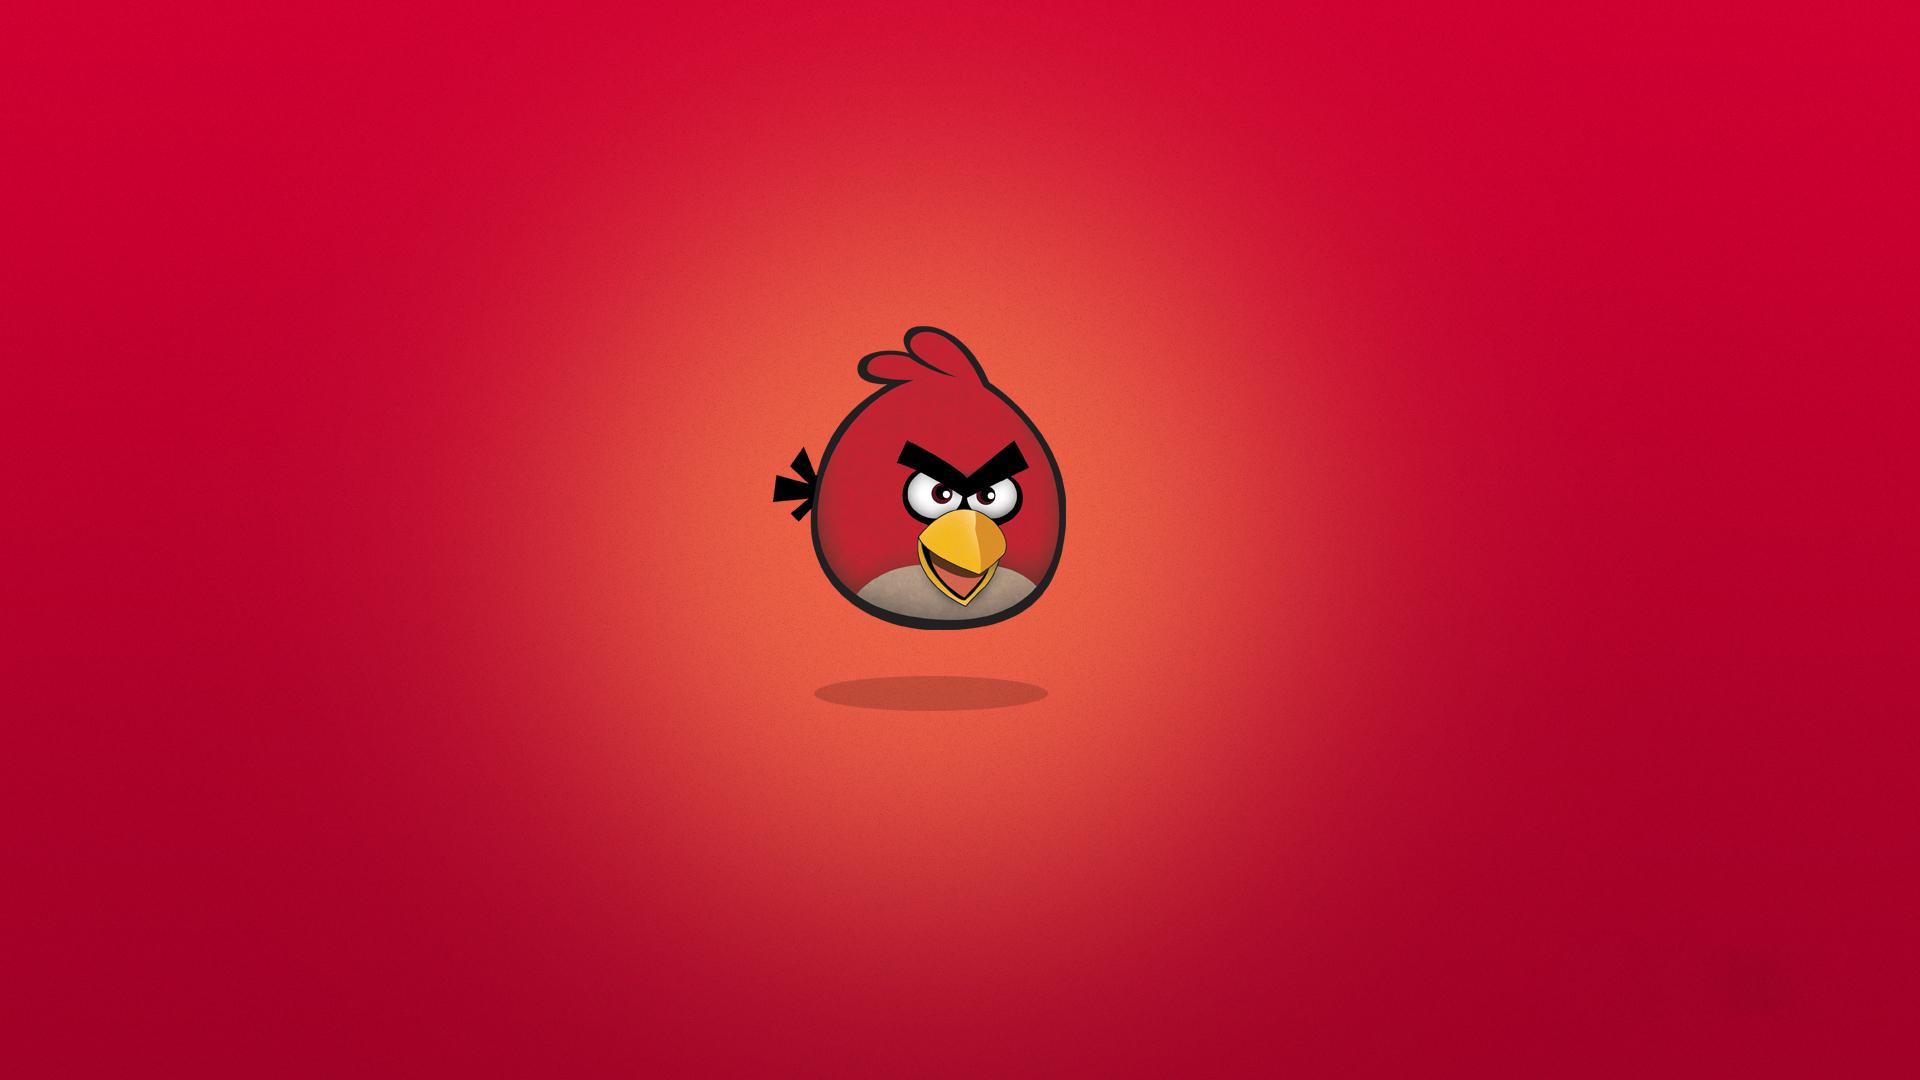 Angry Bird Space Wallpaper 3d Angry Birds Hd Duvar Kağıdı Arka Plan 1920x1080 Id